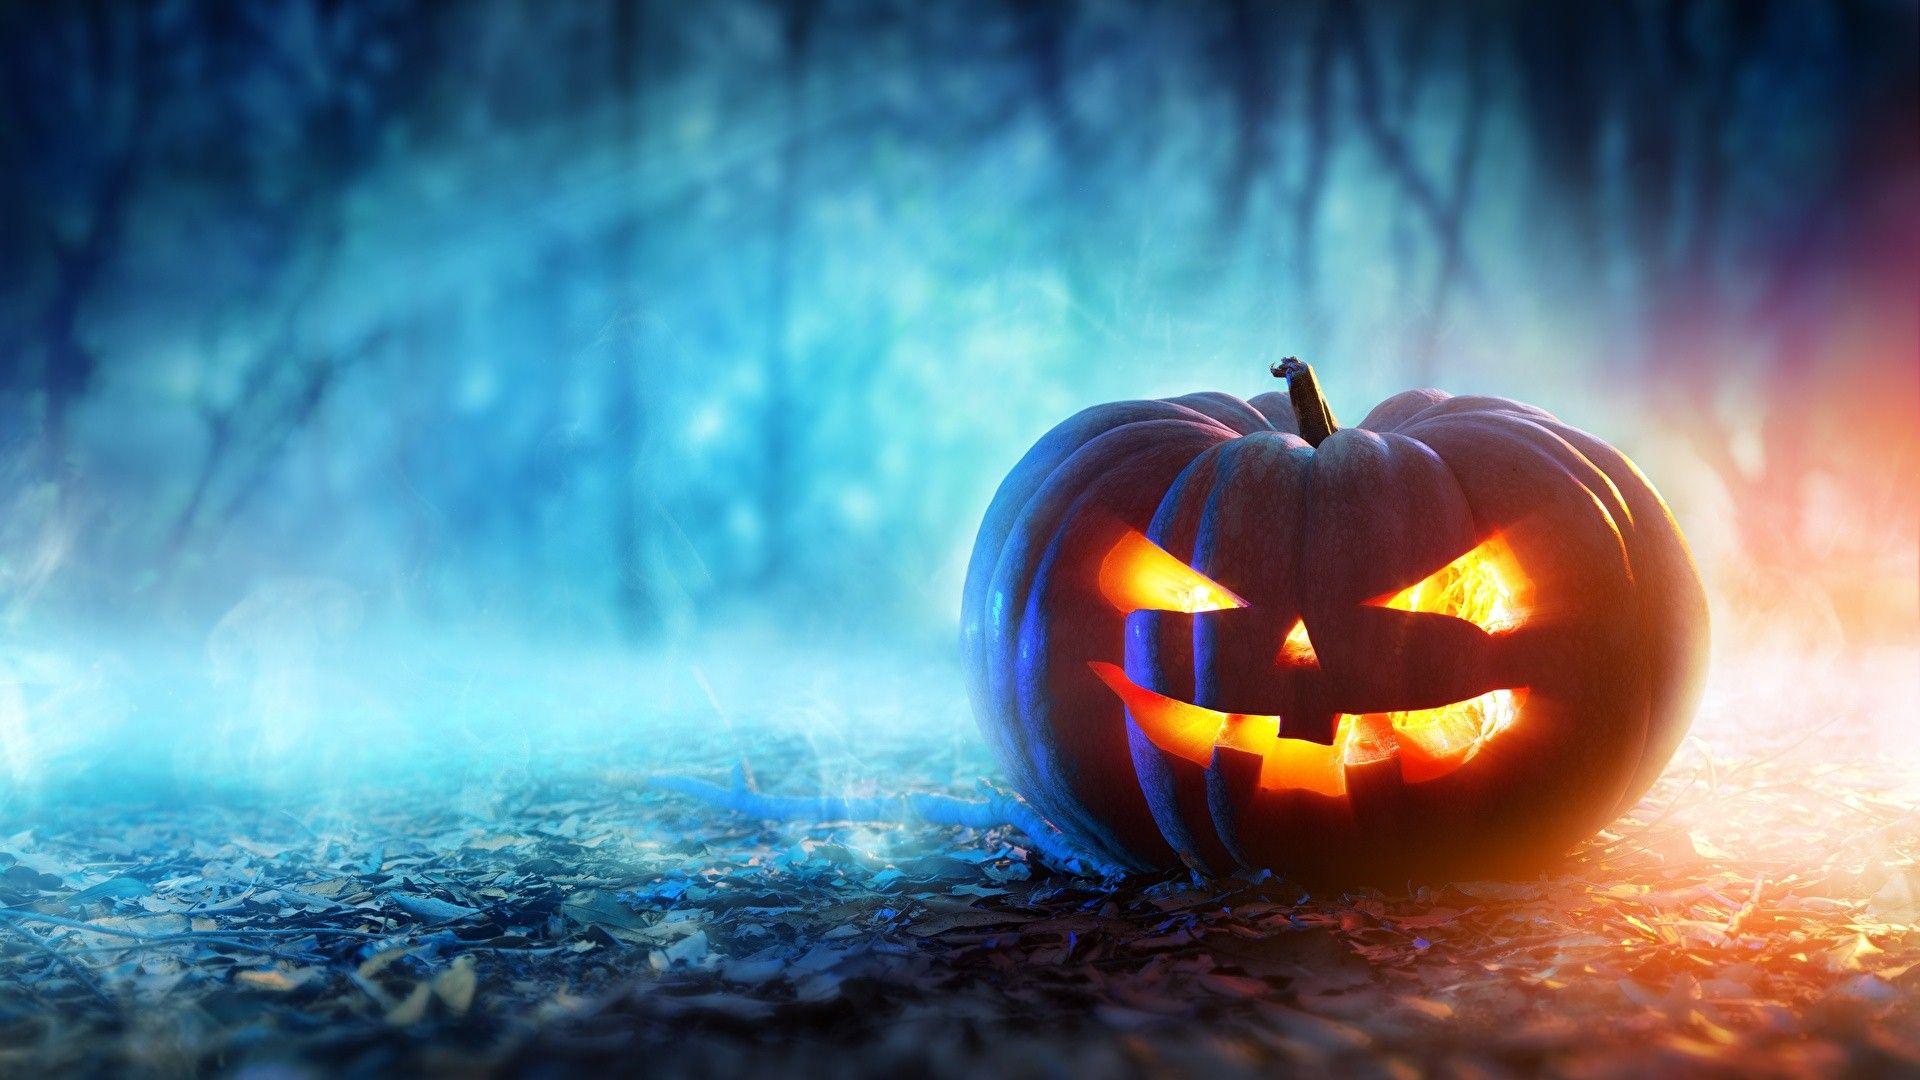 pumpkin desktop background